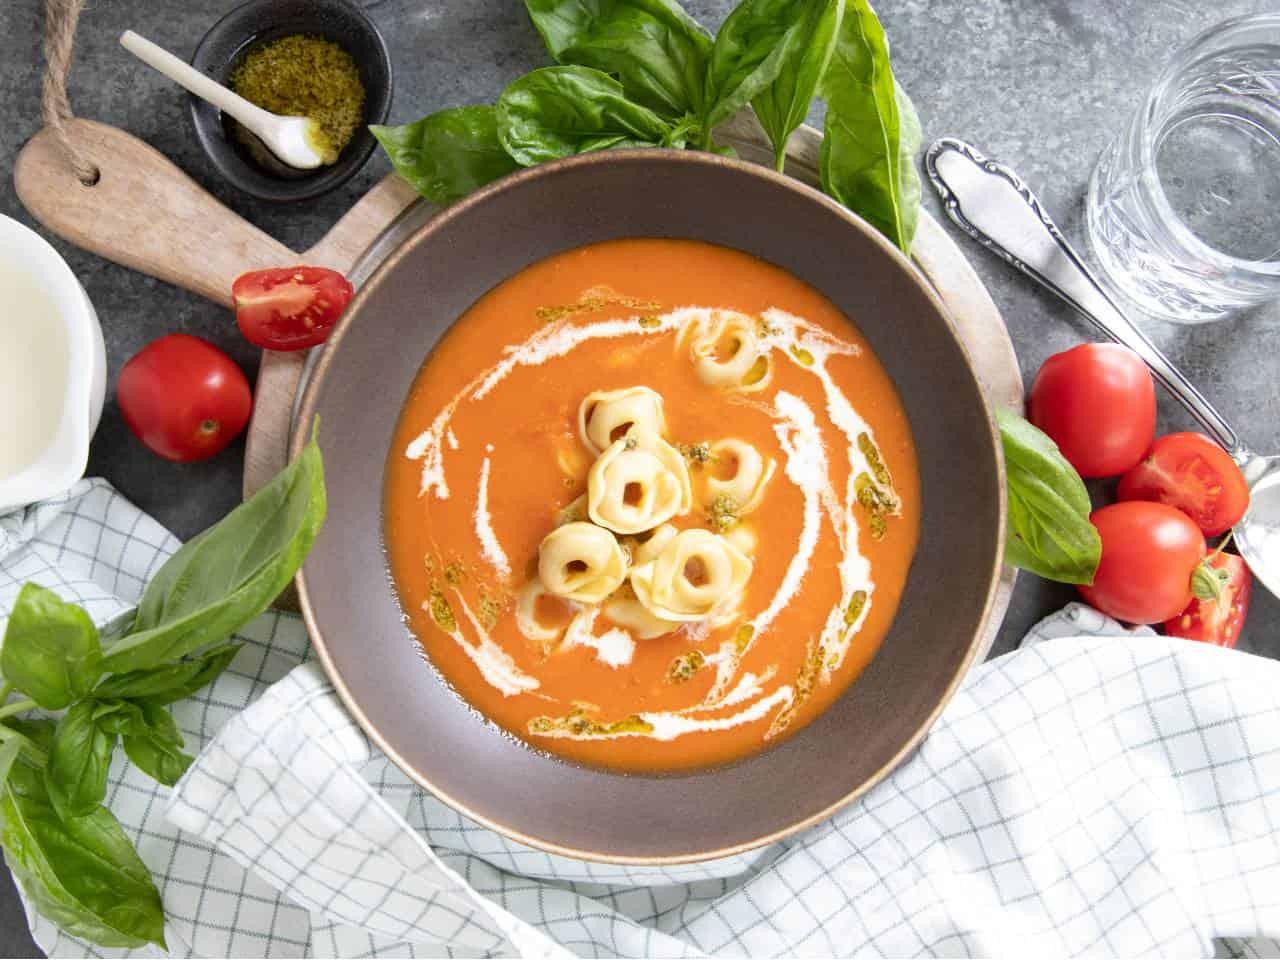 Italiaanse tomatensoep met tortellini, tomatensoep maken, Italiaanse soep, tomatensoep met verse tomaten, recept tomatensoep, recept Italiaanse tomatensoep